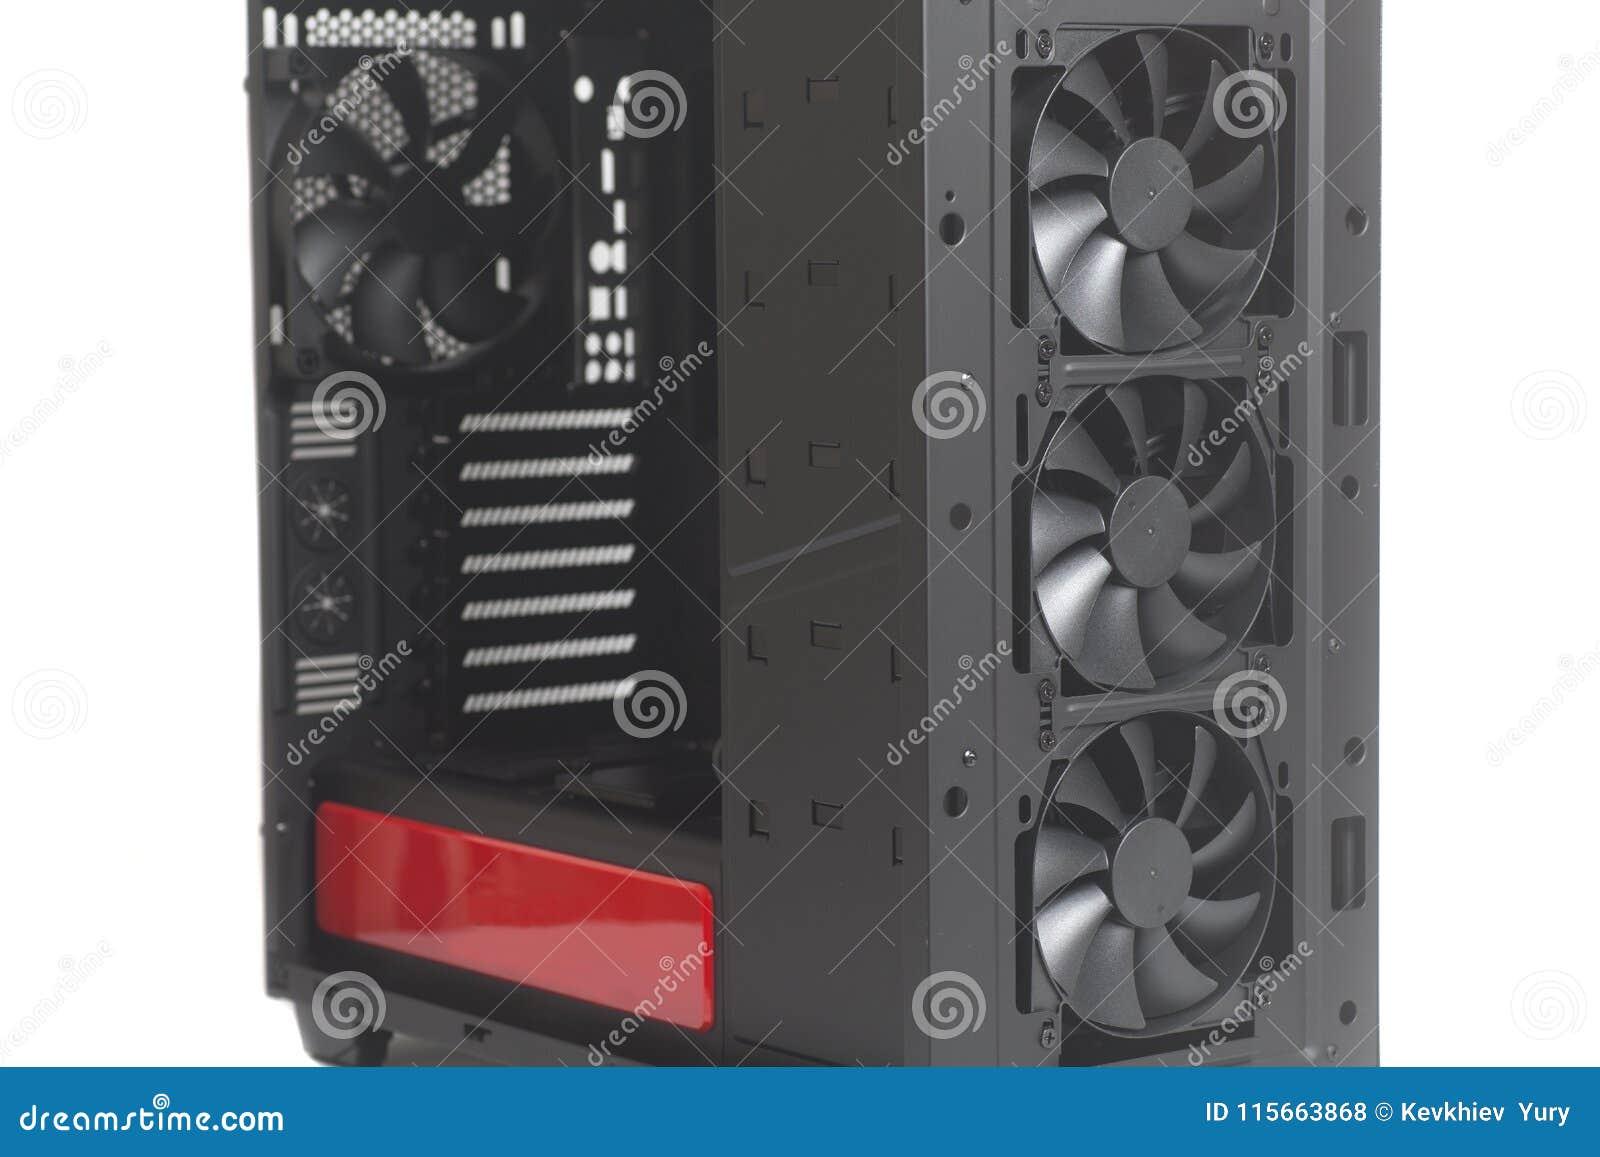 Desktop κενό PC υπόθεσης υπολογιστών με τον ανεμιστήρα δοχείων ψύξης